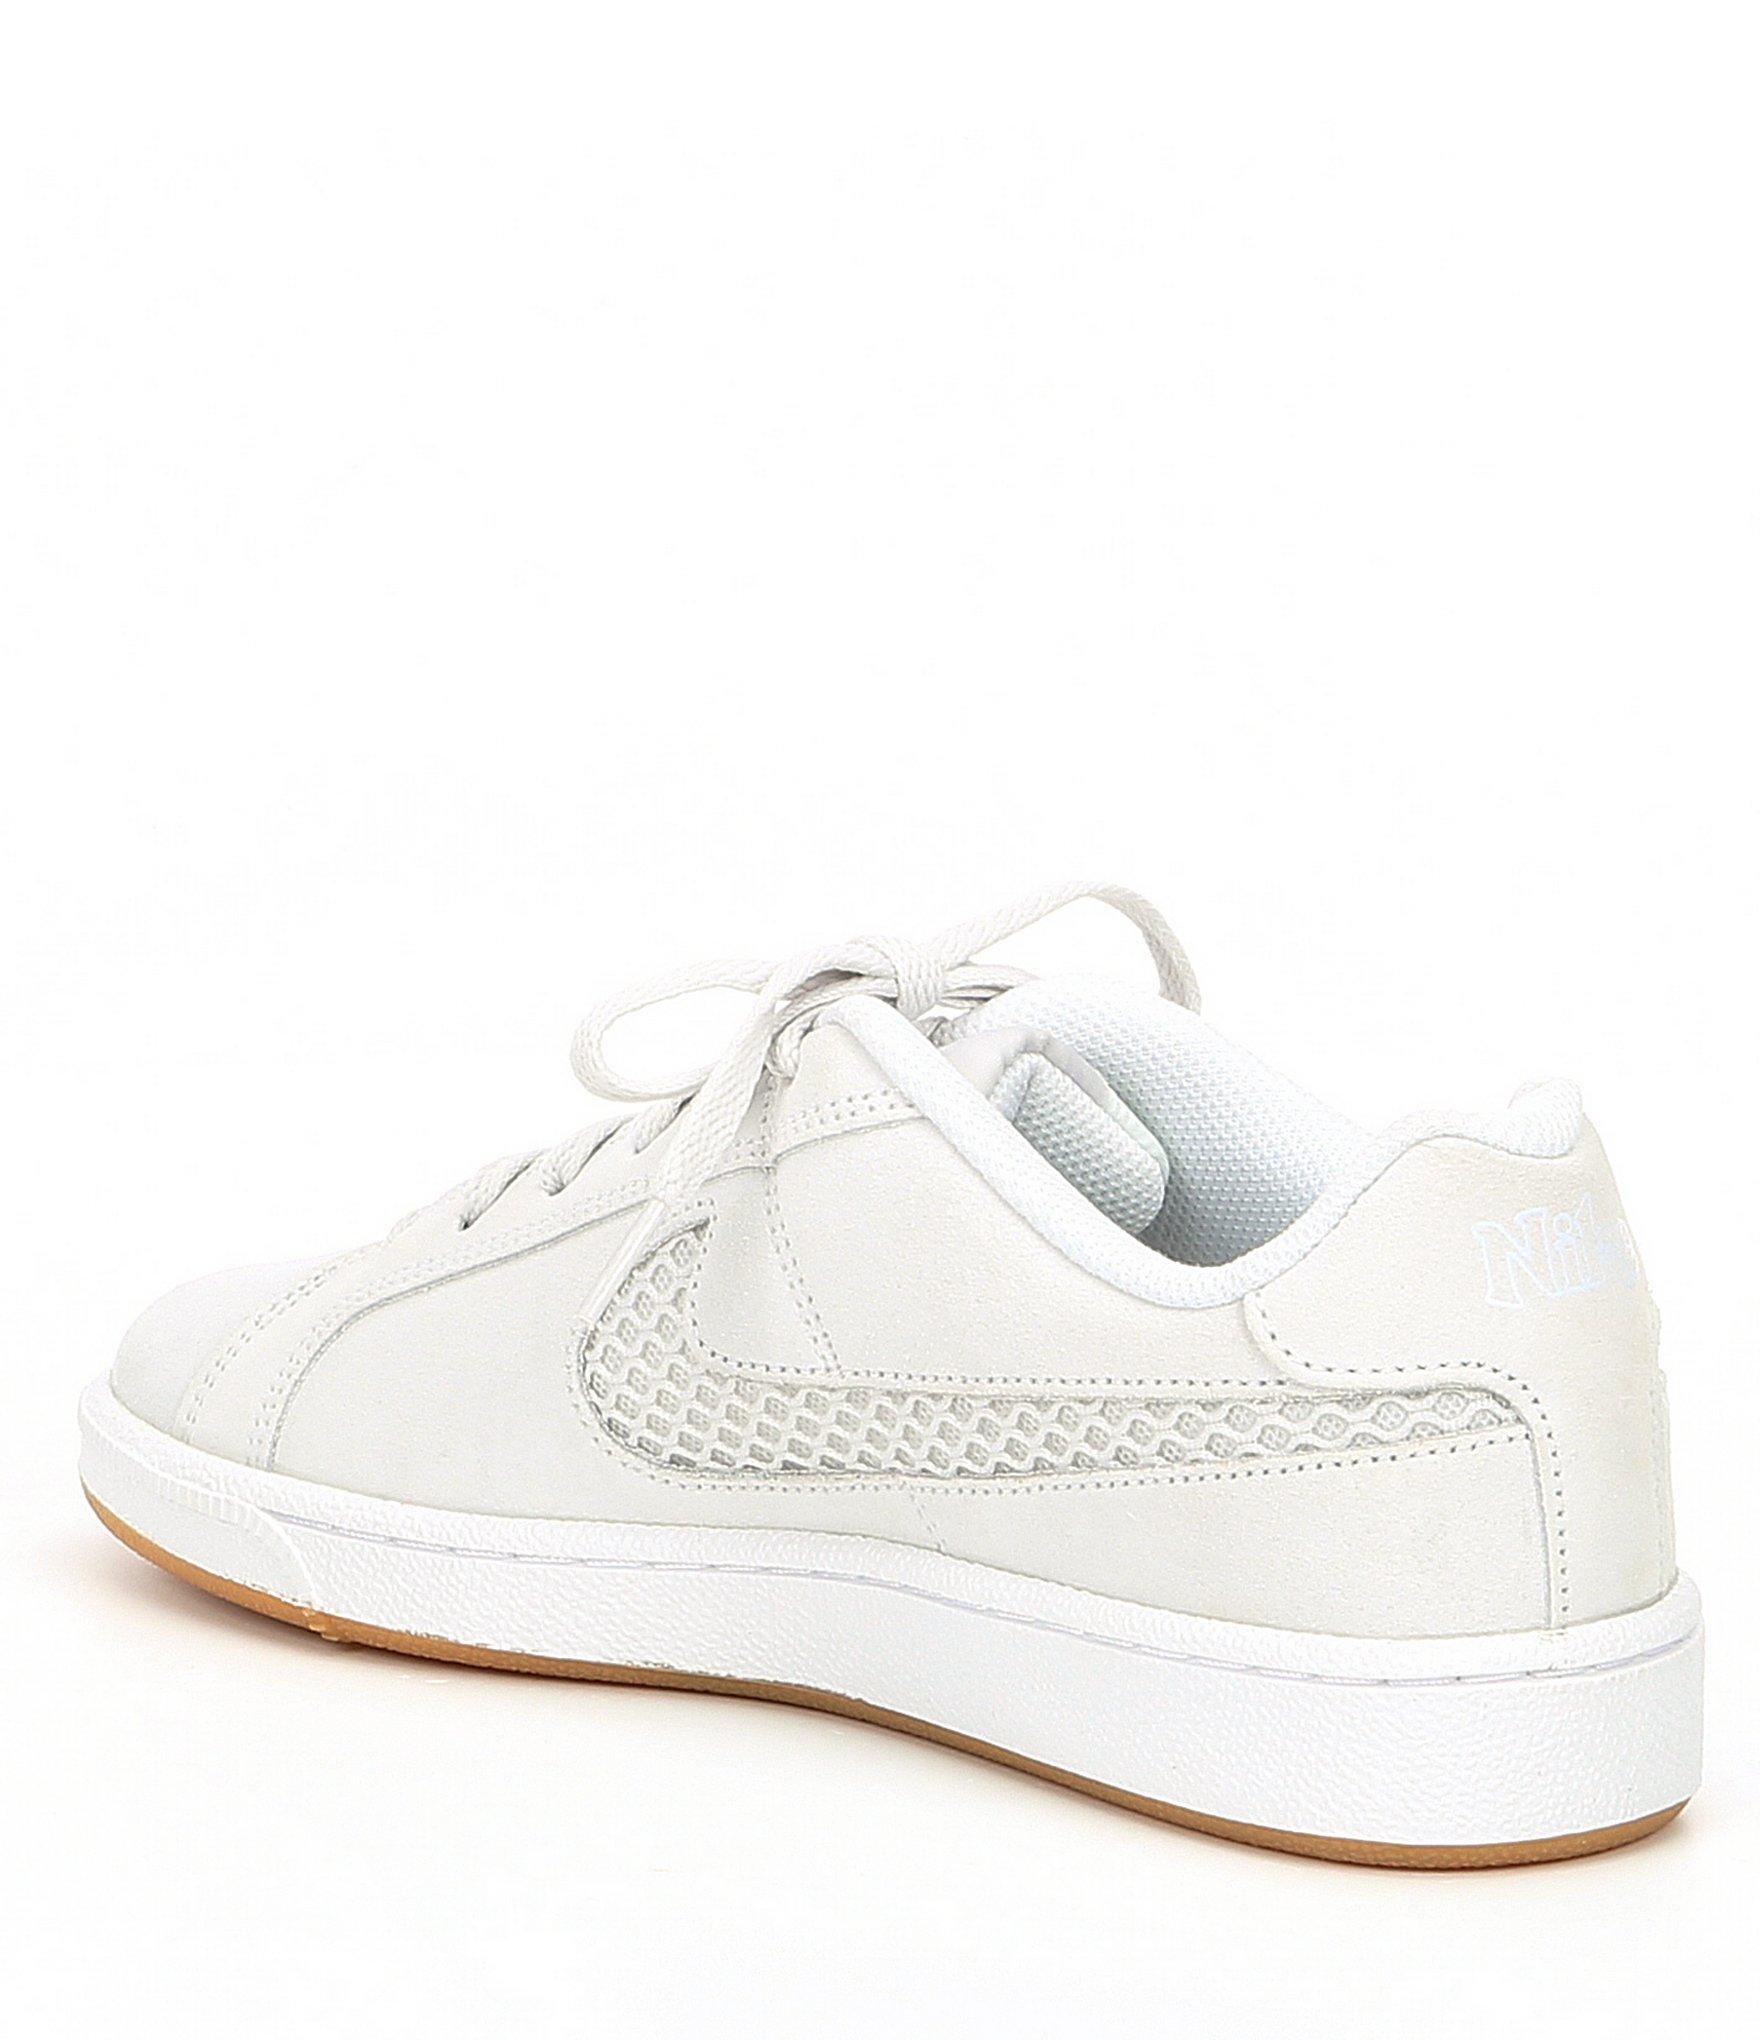 Nike - White Women s Court Royale Premium Lifestyle Shoe - Lyst. View  fullscreen 2ce1a058de